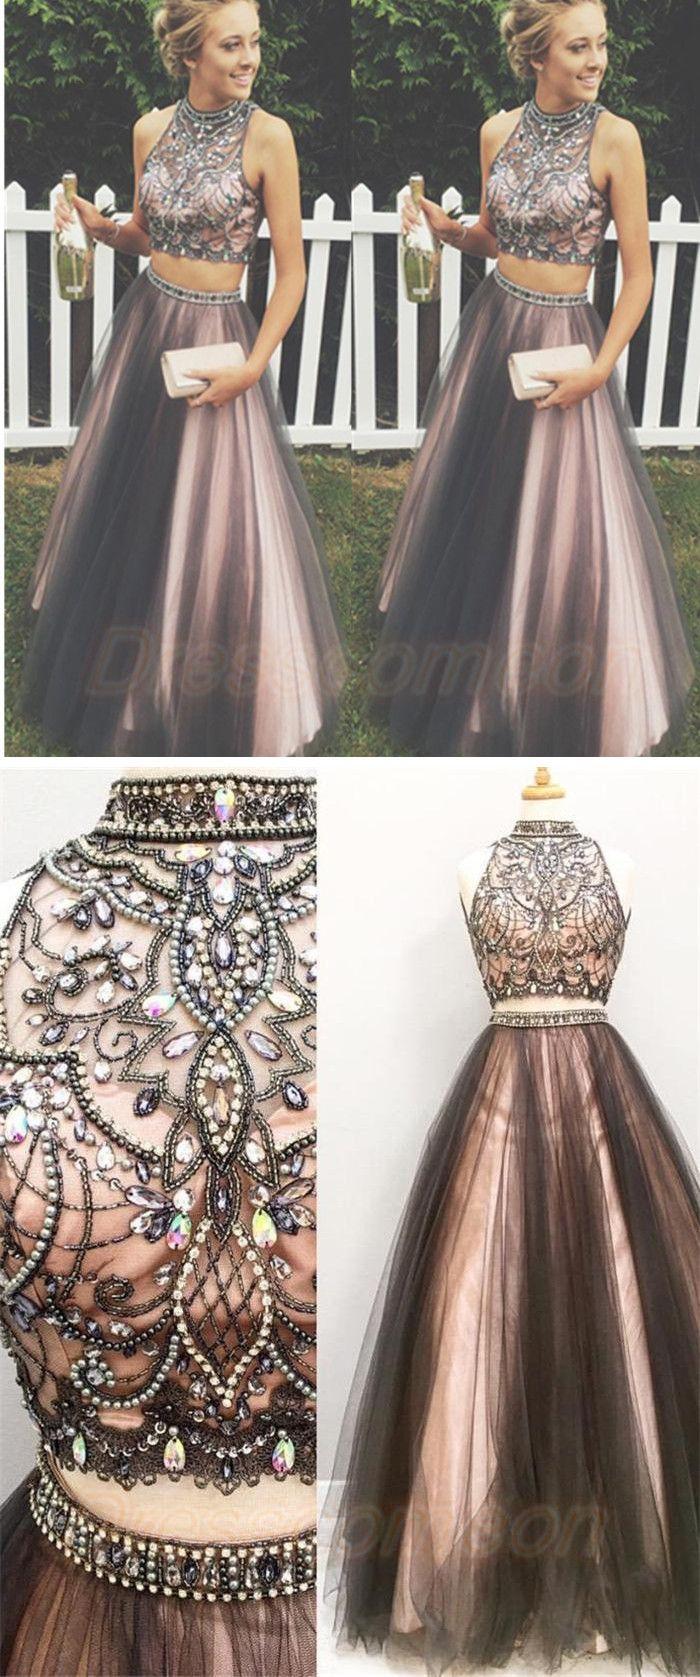 Teens Plus Size Prom Dresses 121